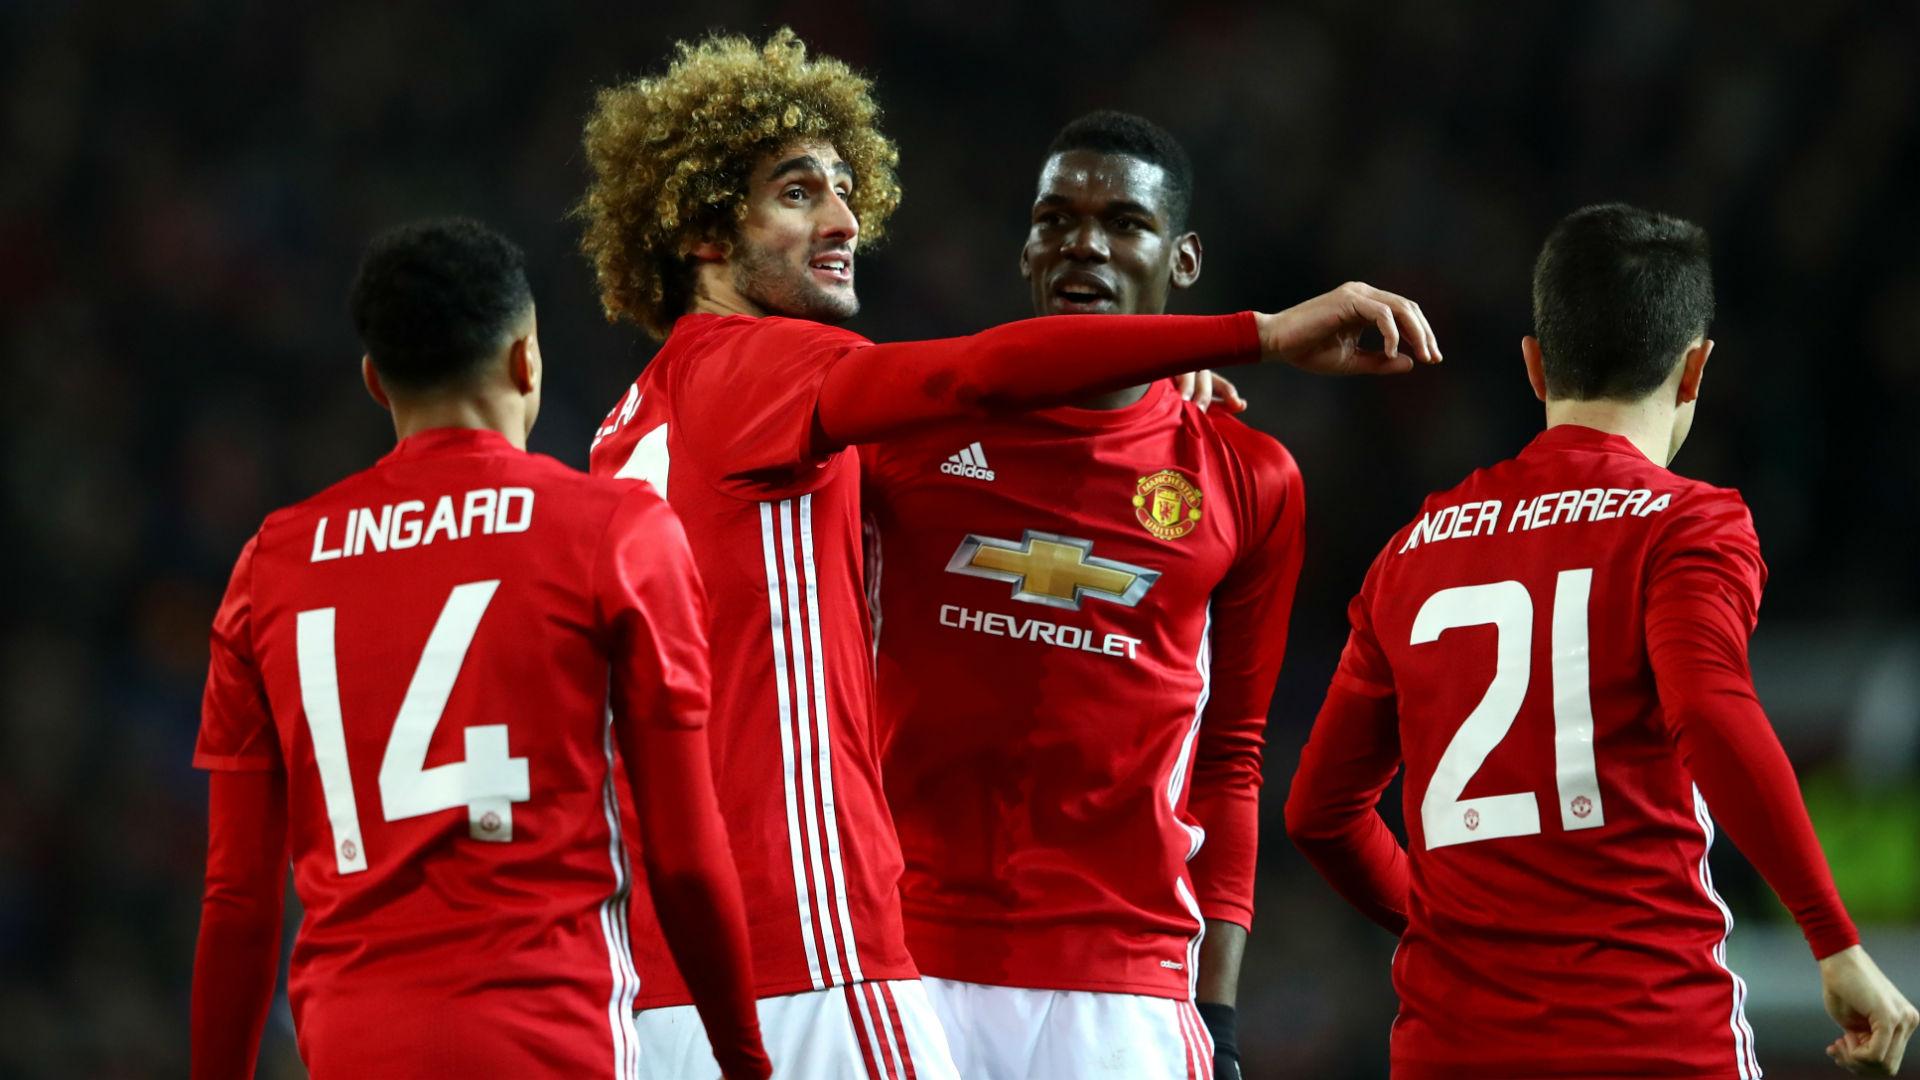 Marouane Fellaini Paul Pogba Manchester United